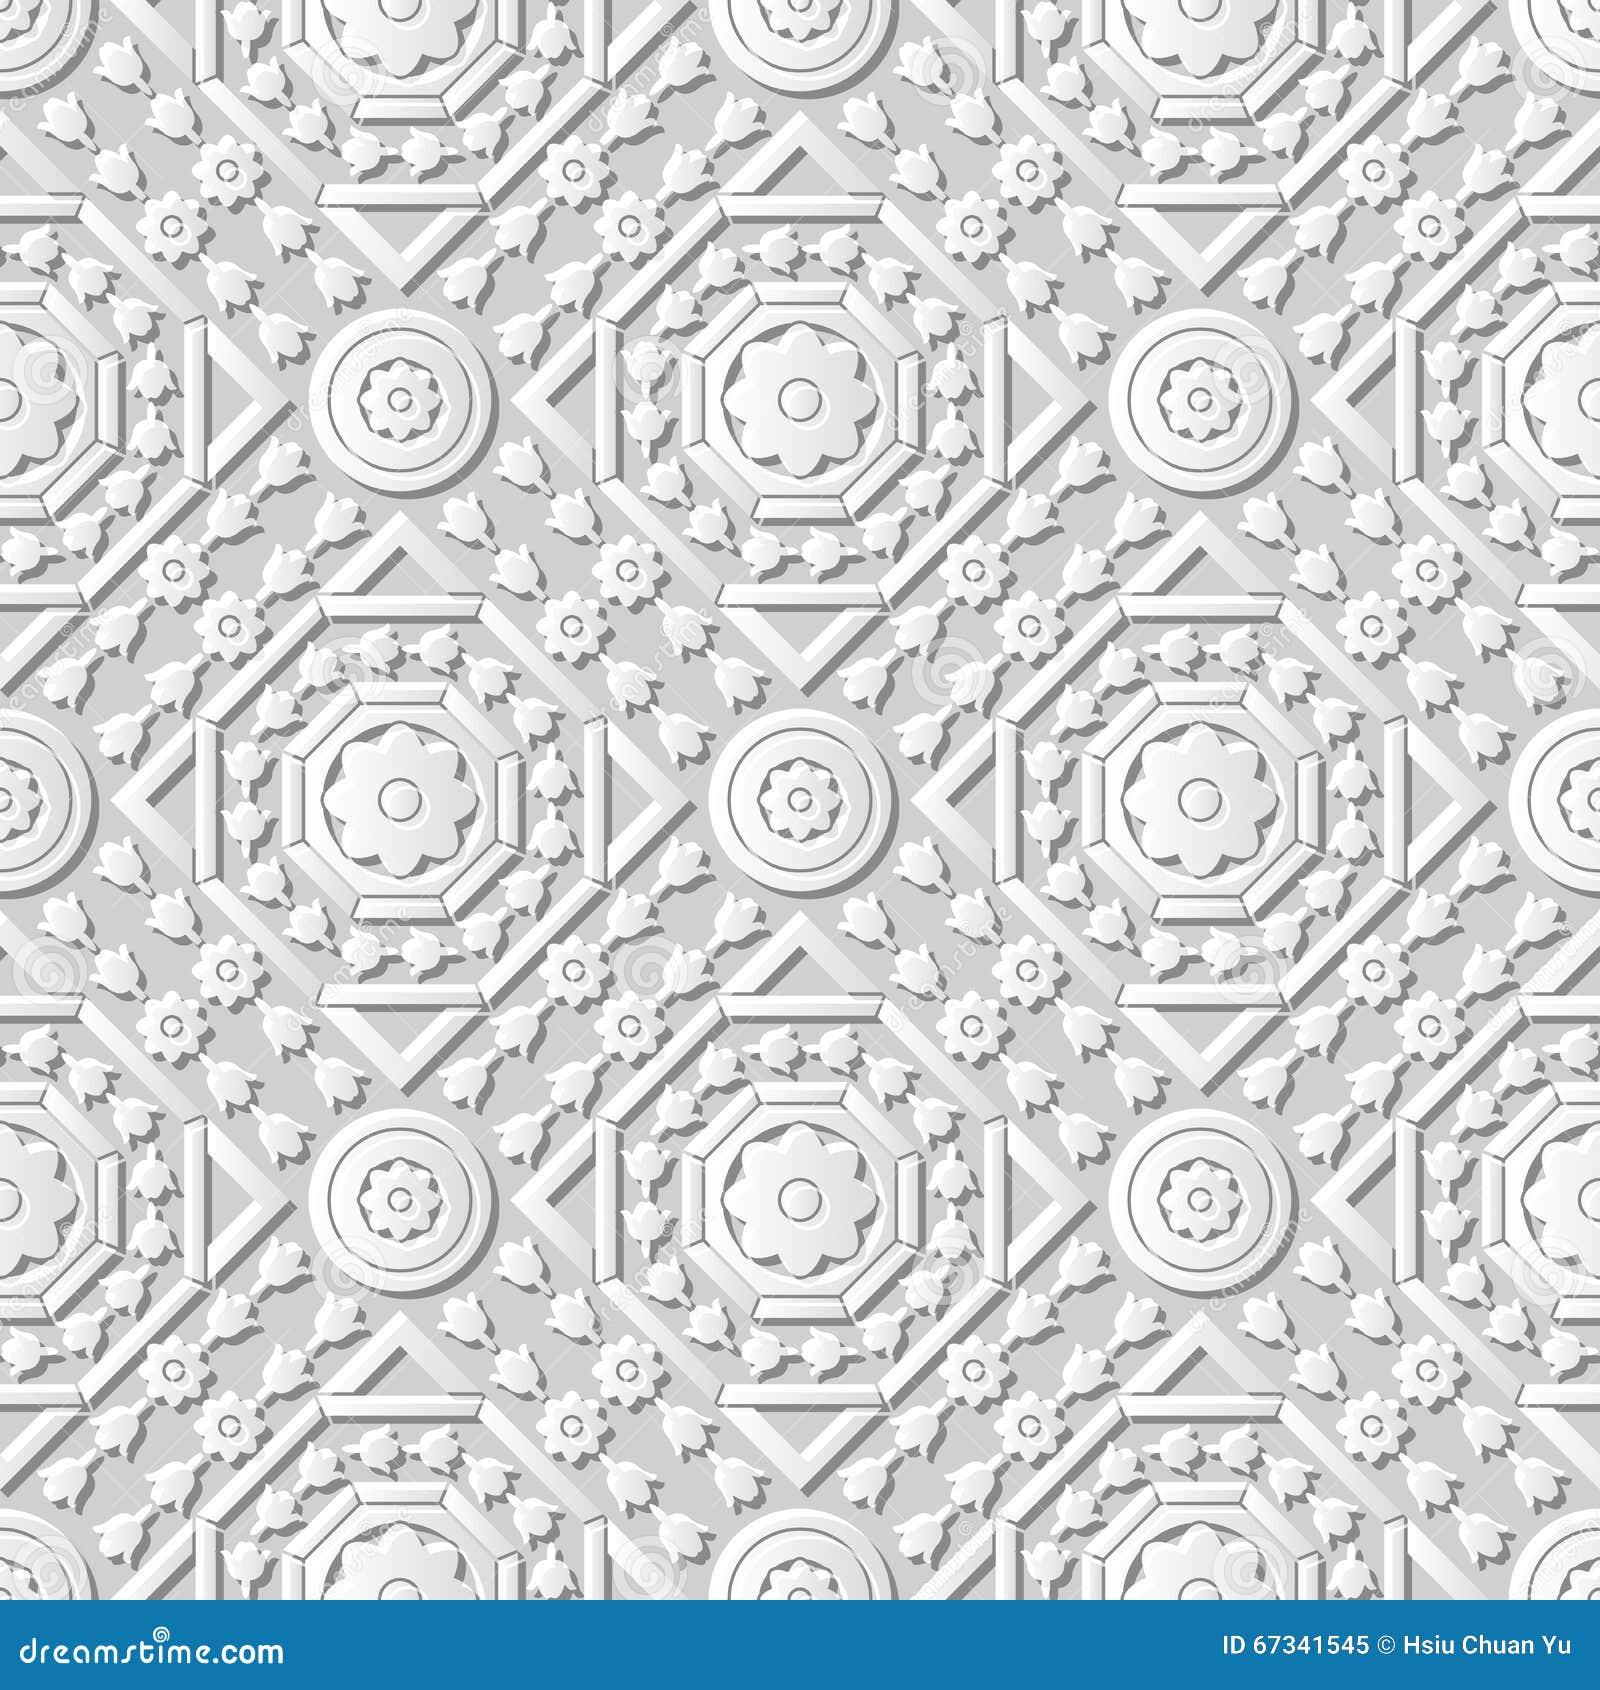 vector damask seamless 3d paper art pattern background 219